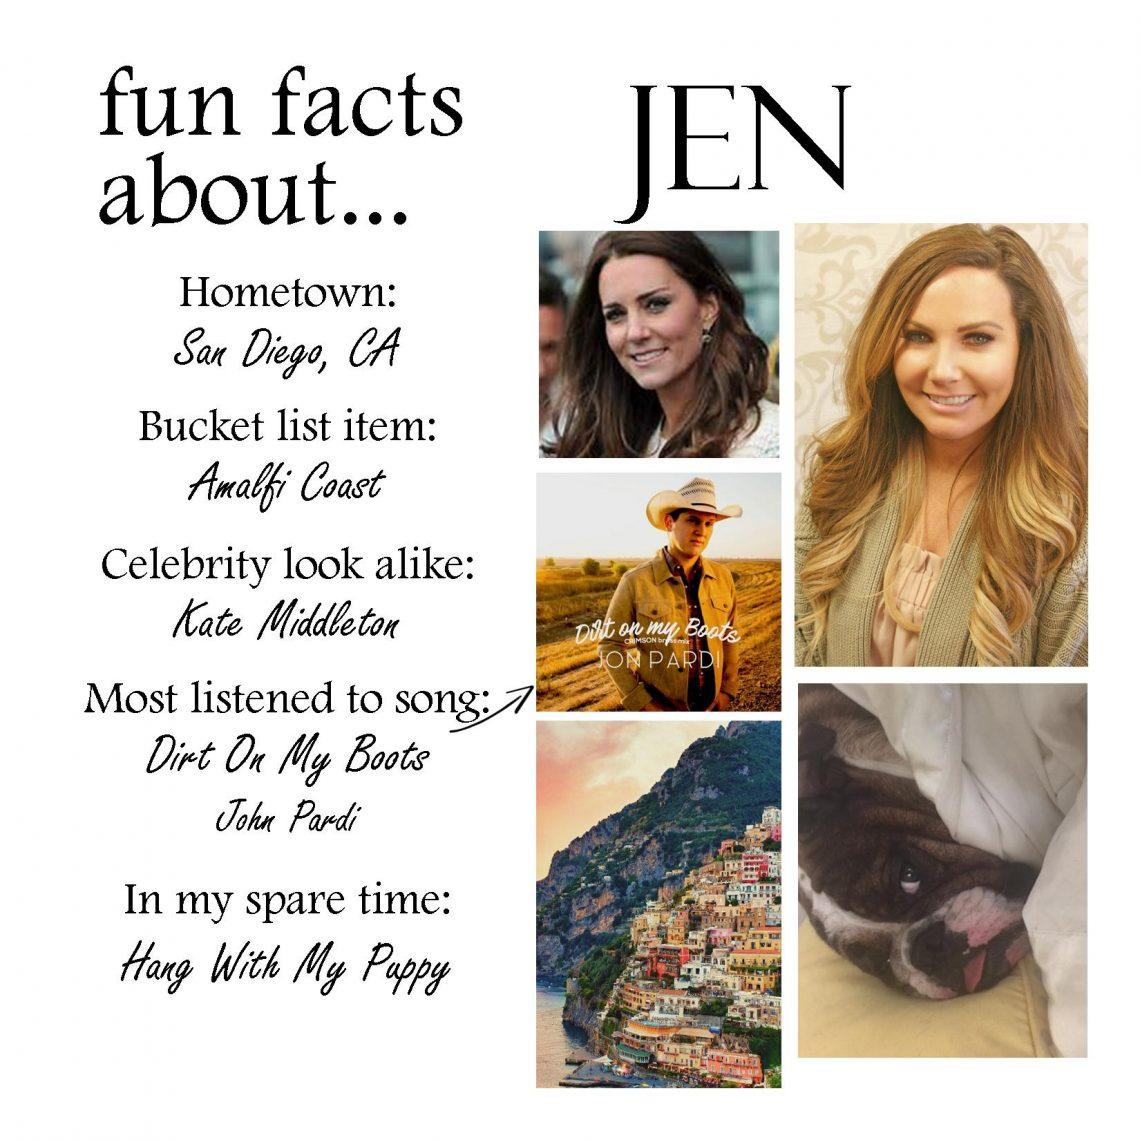 jen-m-fun-fact